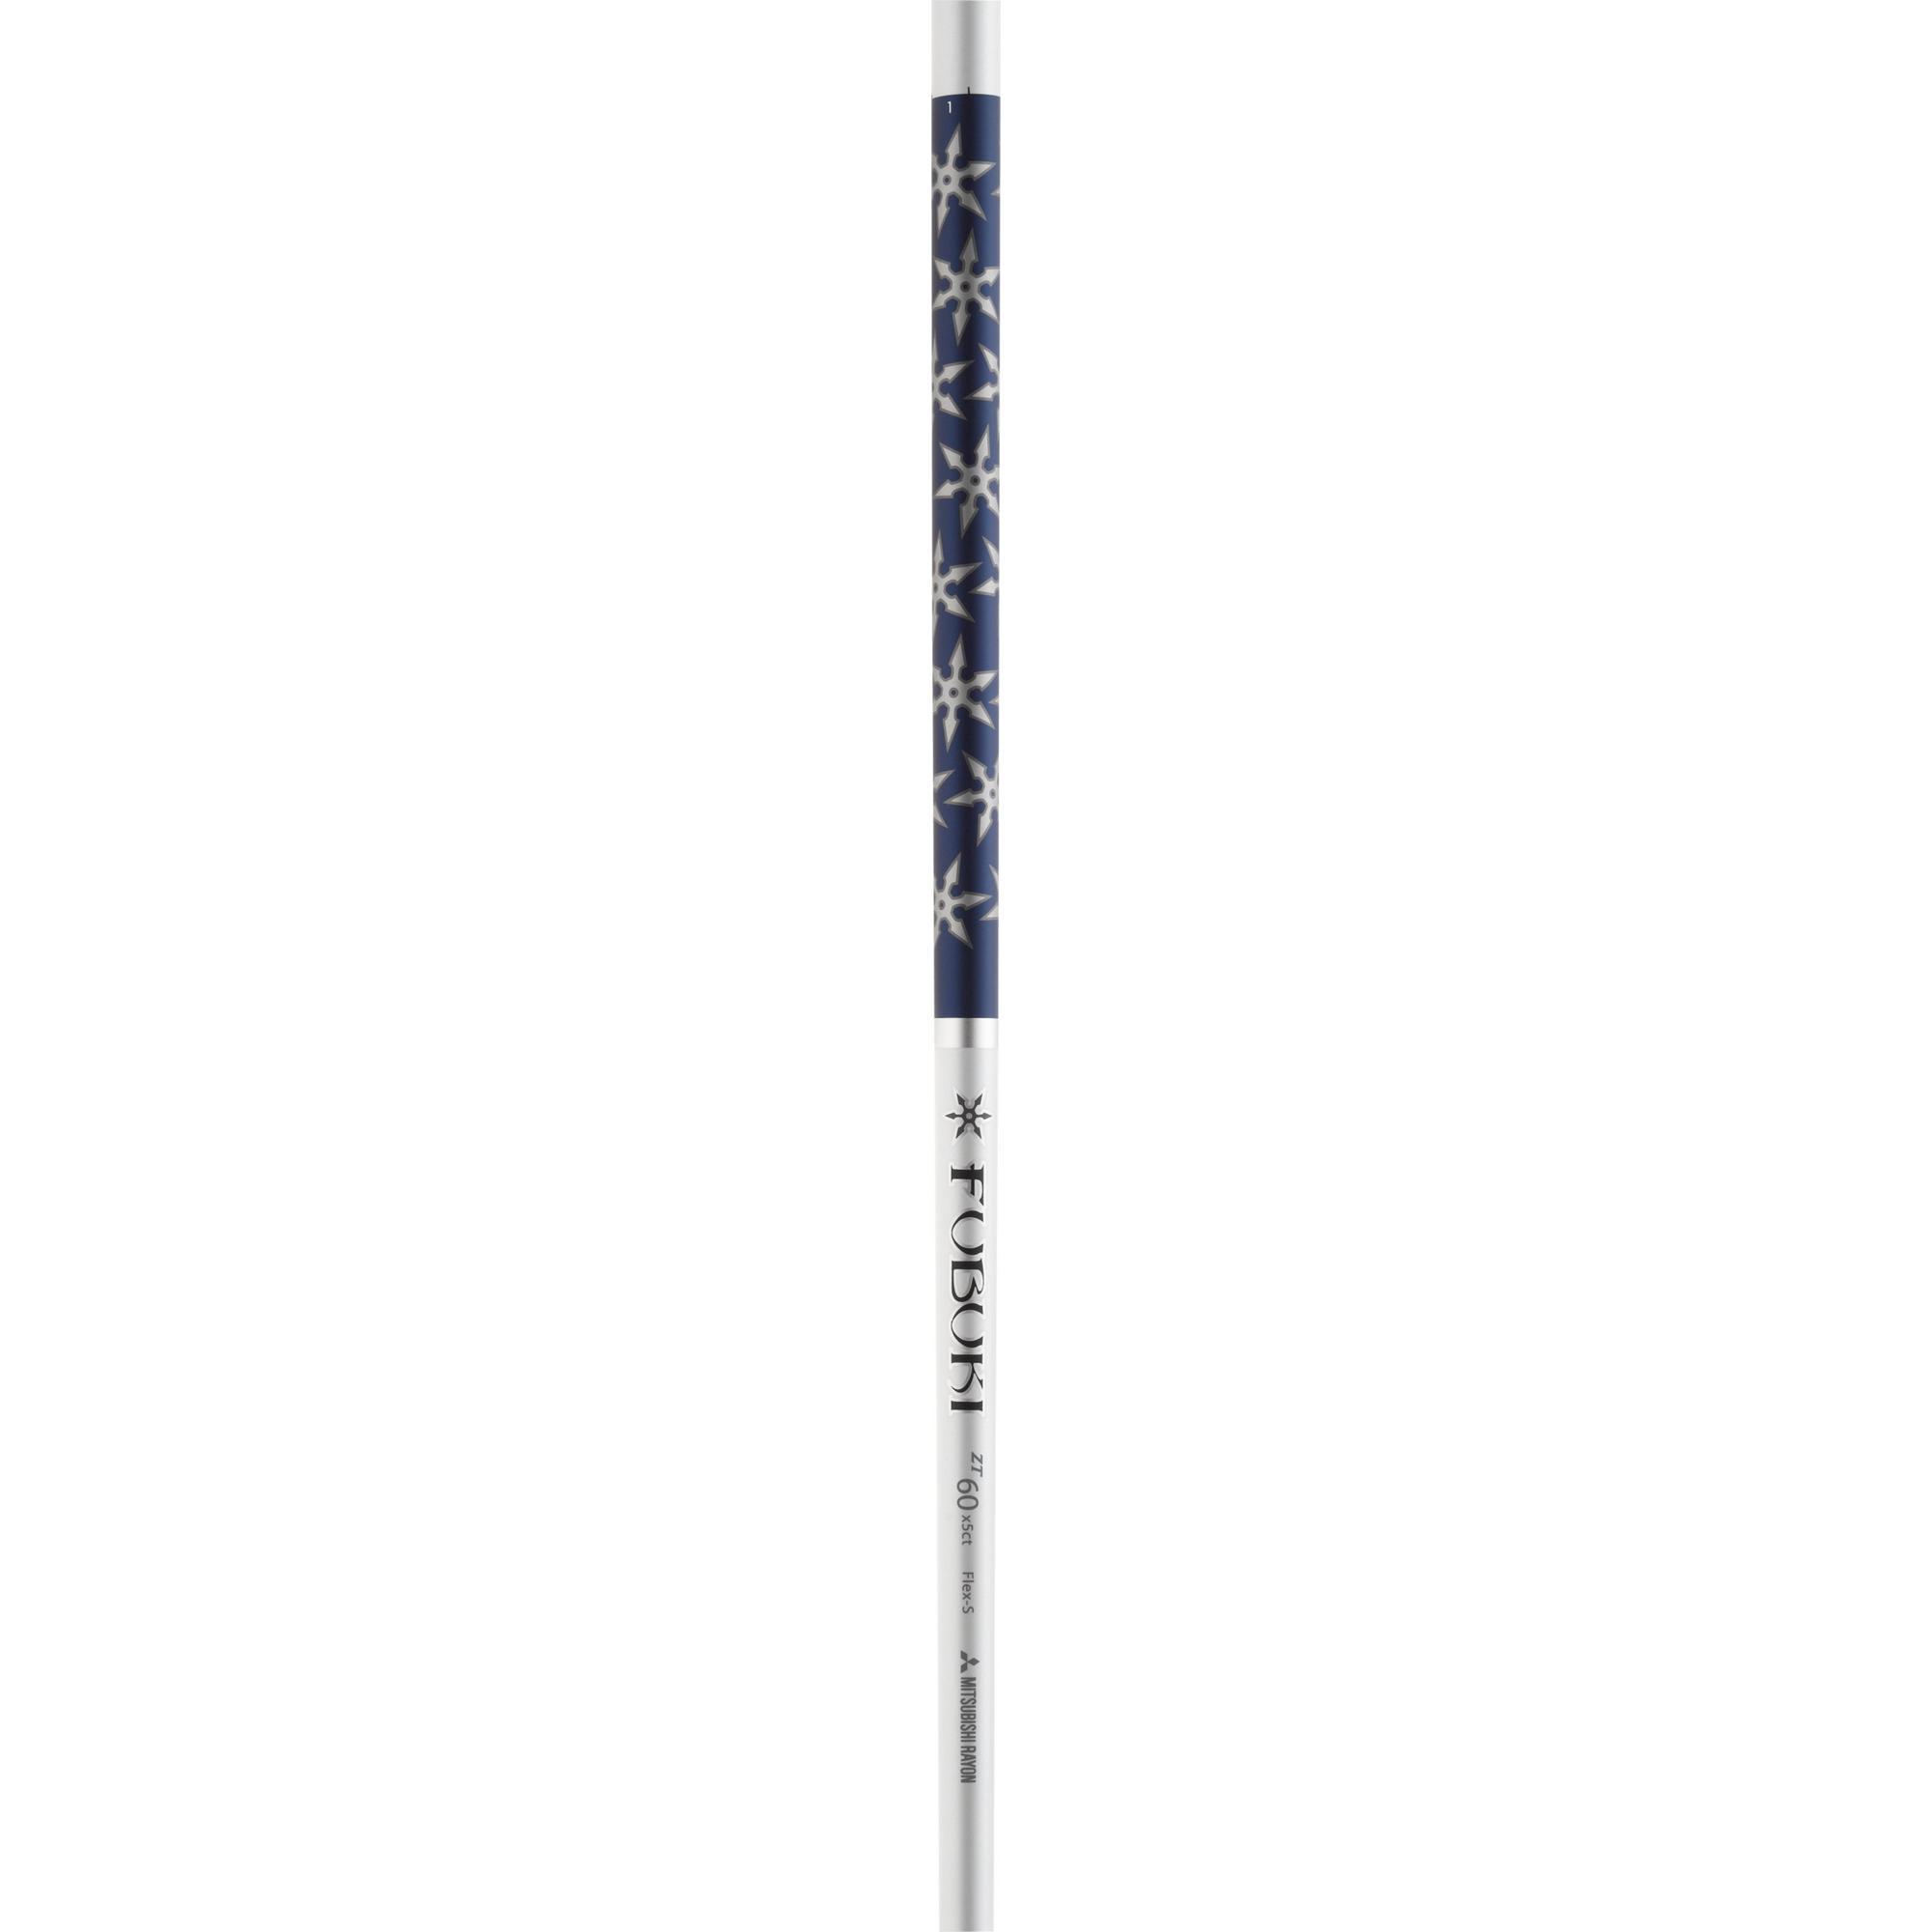 Tige en graphite Fubuki ZT 60 .335 pour bois